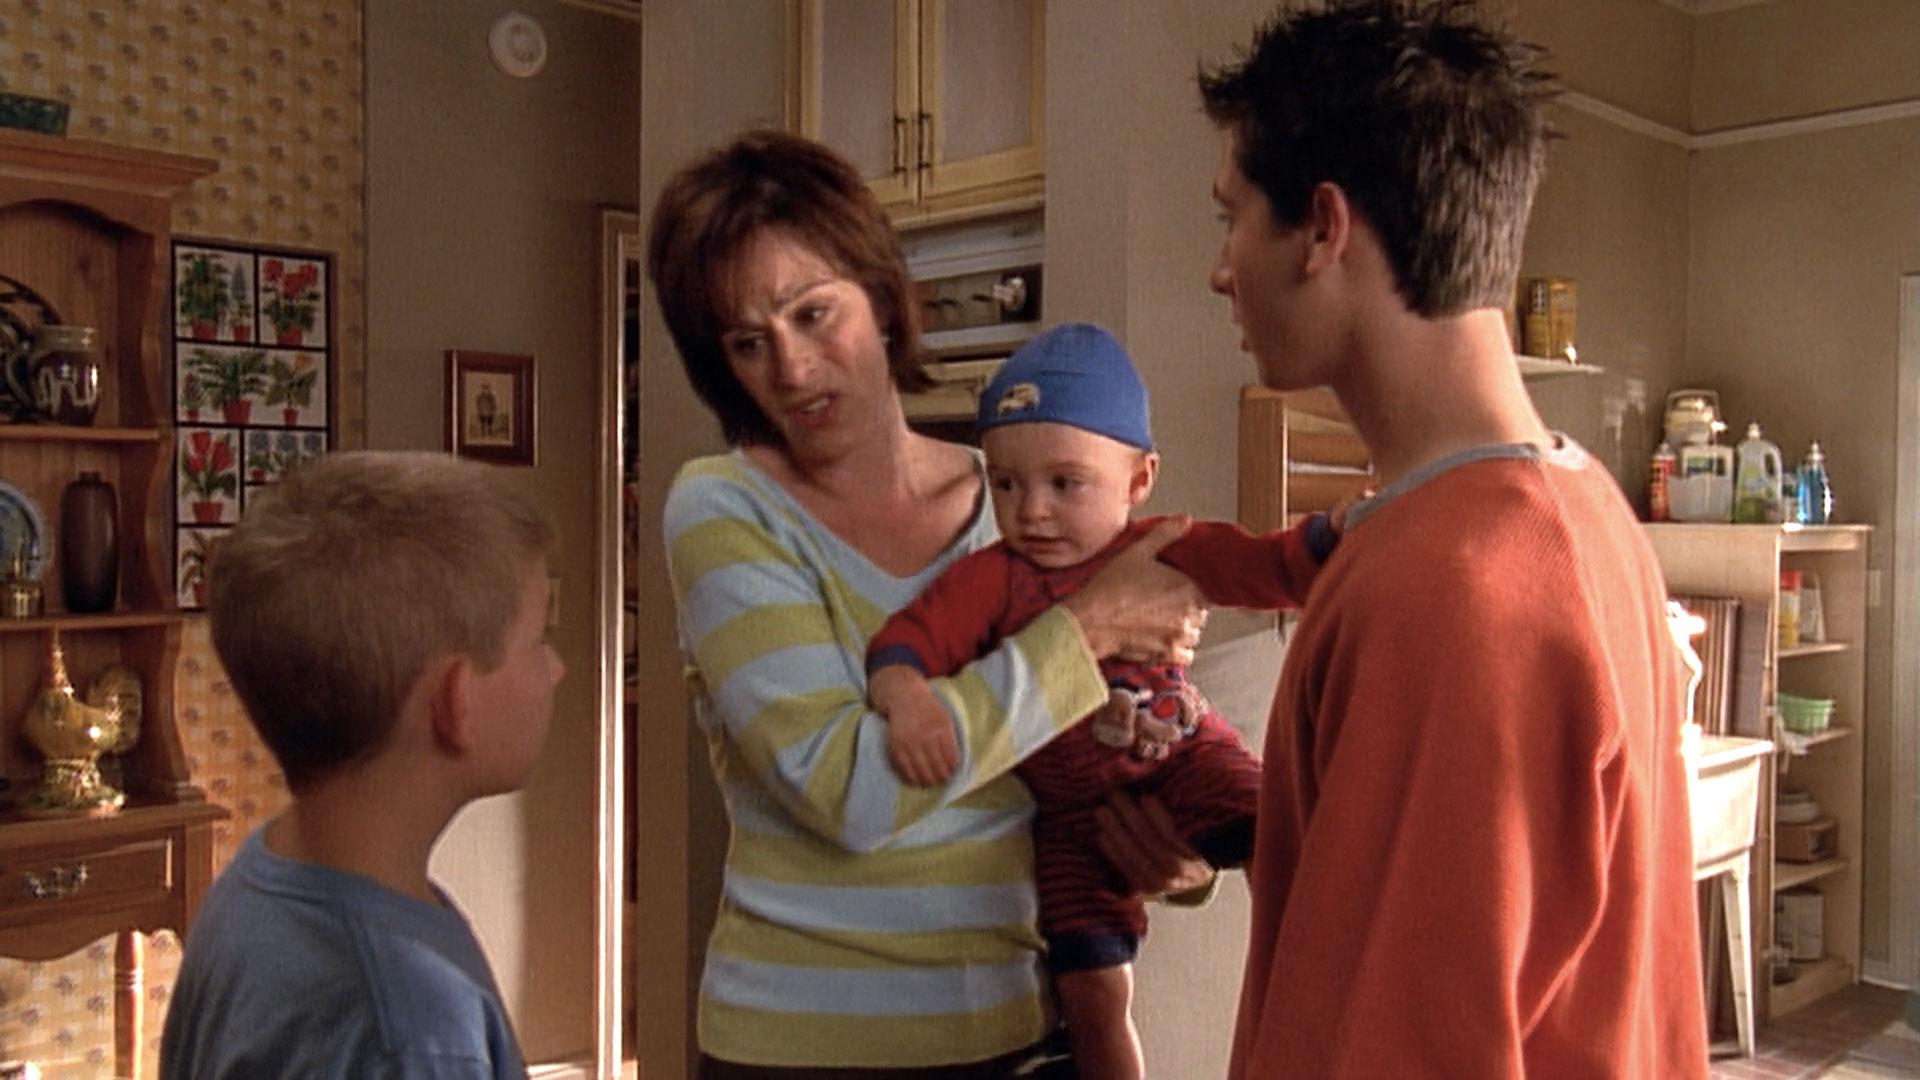 Erik Per Sullivan (Dewey), Jane Kaczmarek (Lois) et Justin Berfield (Reese) dans